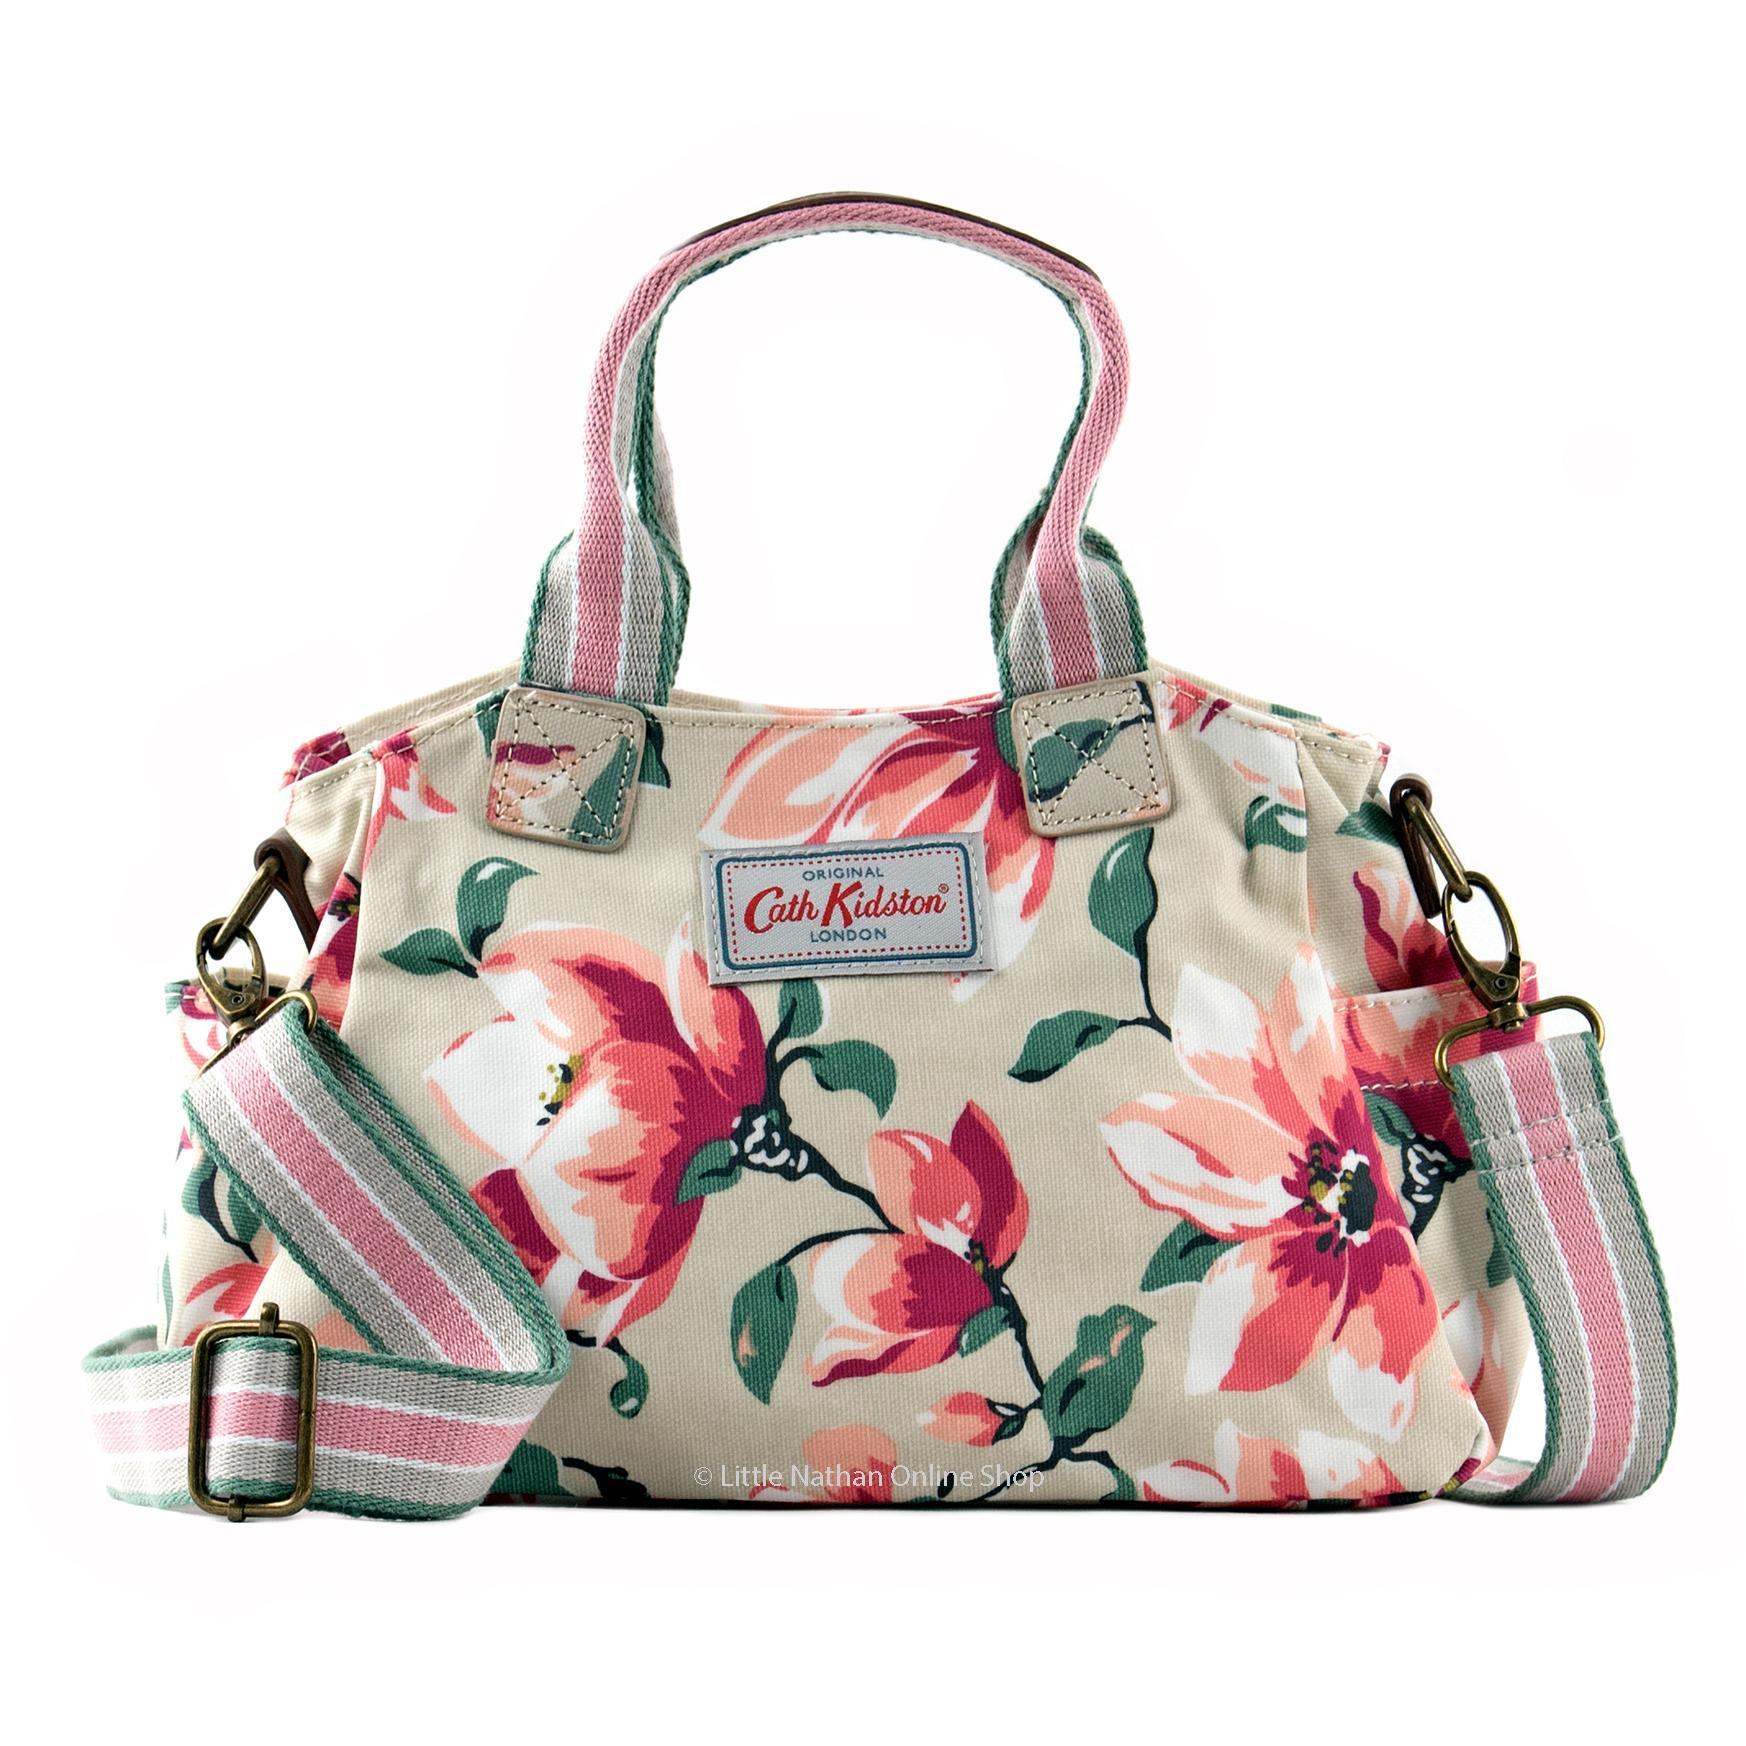 Cath Kidston Mini Day Bag With Cross Body Detachable Strap Magnolia